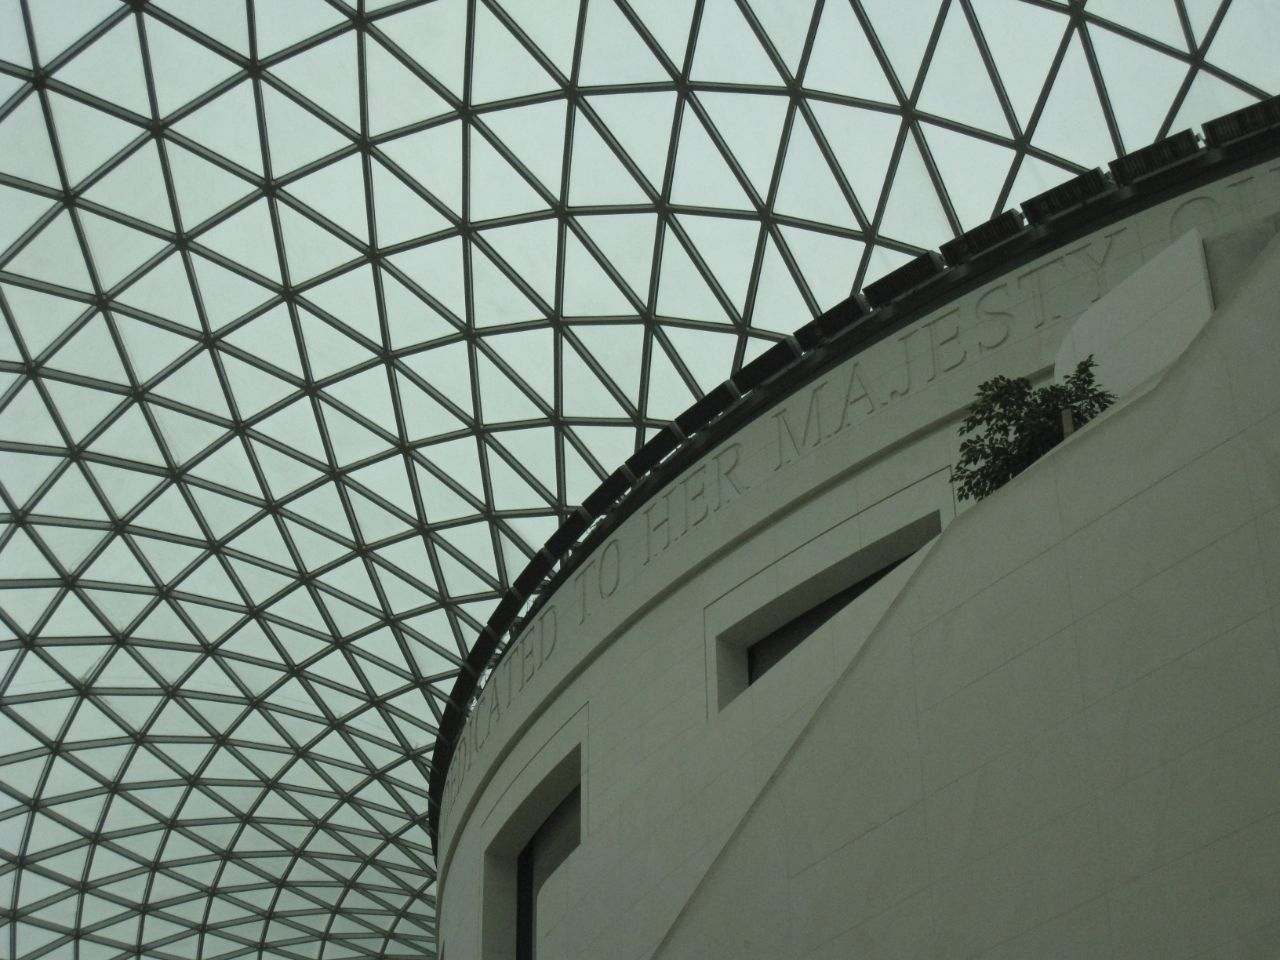 The main foyer at the British Museum